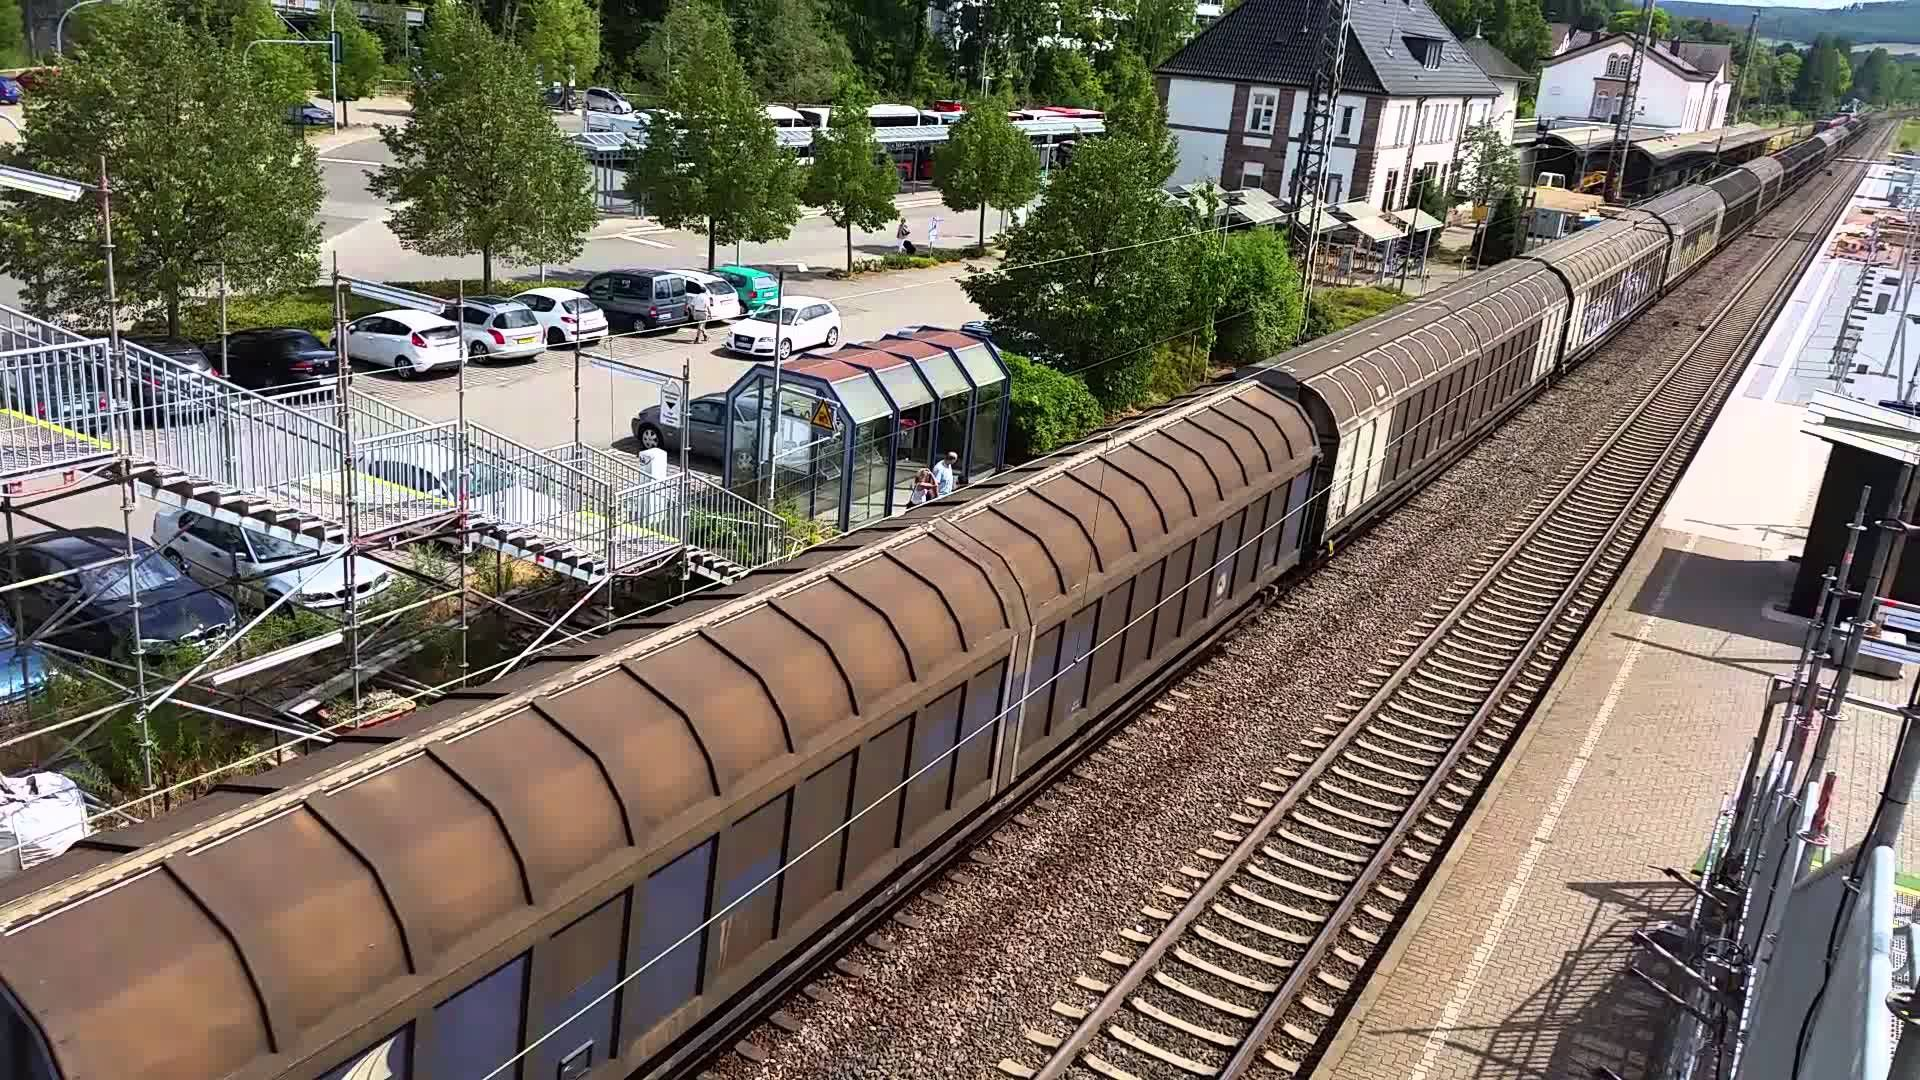 Gueterzug von #Merzig  [Saar ] nach Besseringen  #Saarland  #Merzig #Saarland http://saar.city/?p=26403